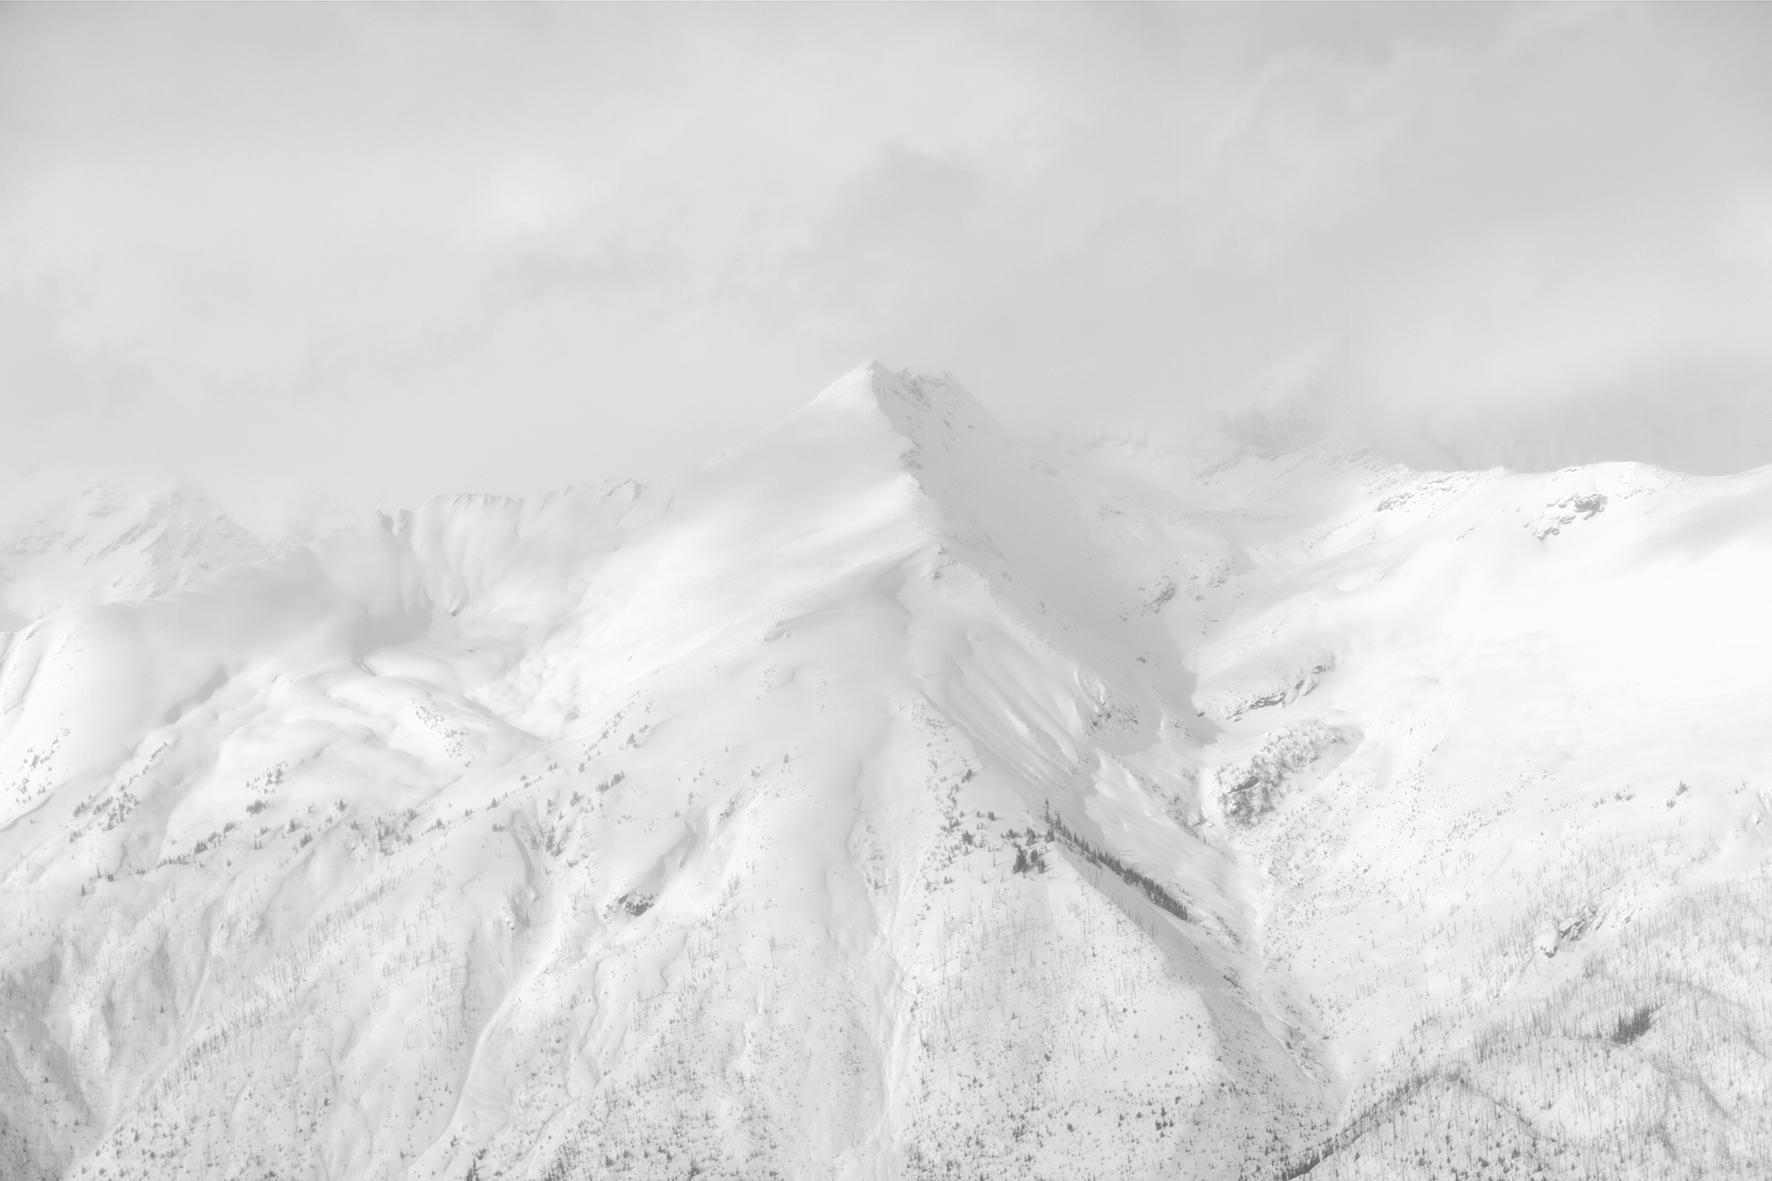 White Mountain (series: Articulate Silence), 2012